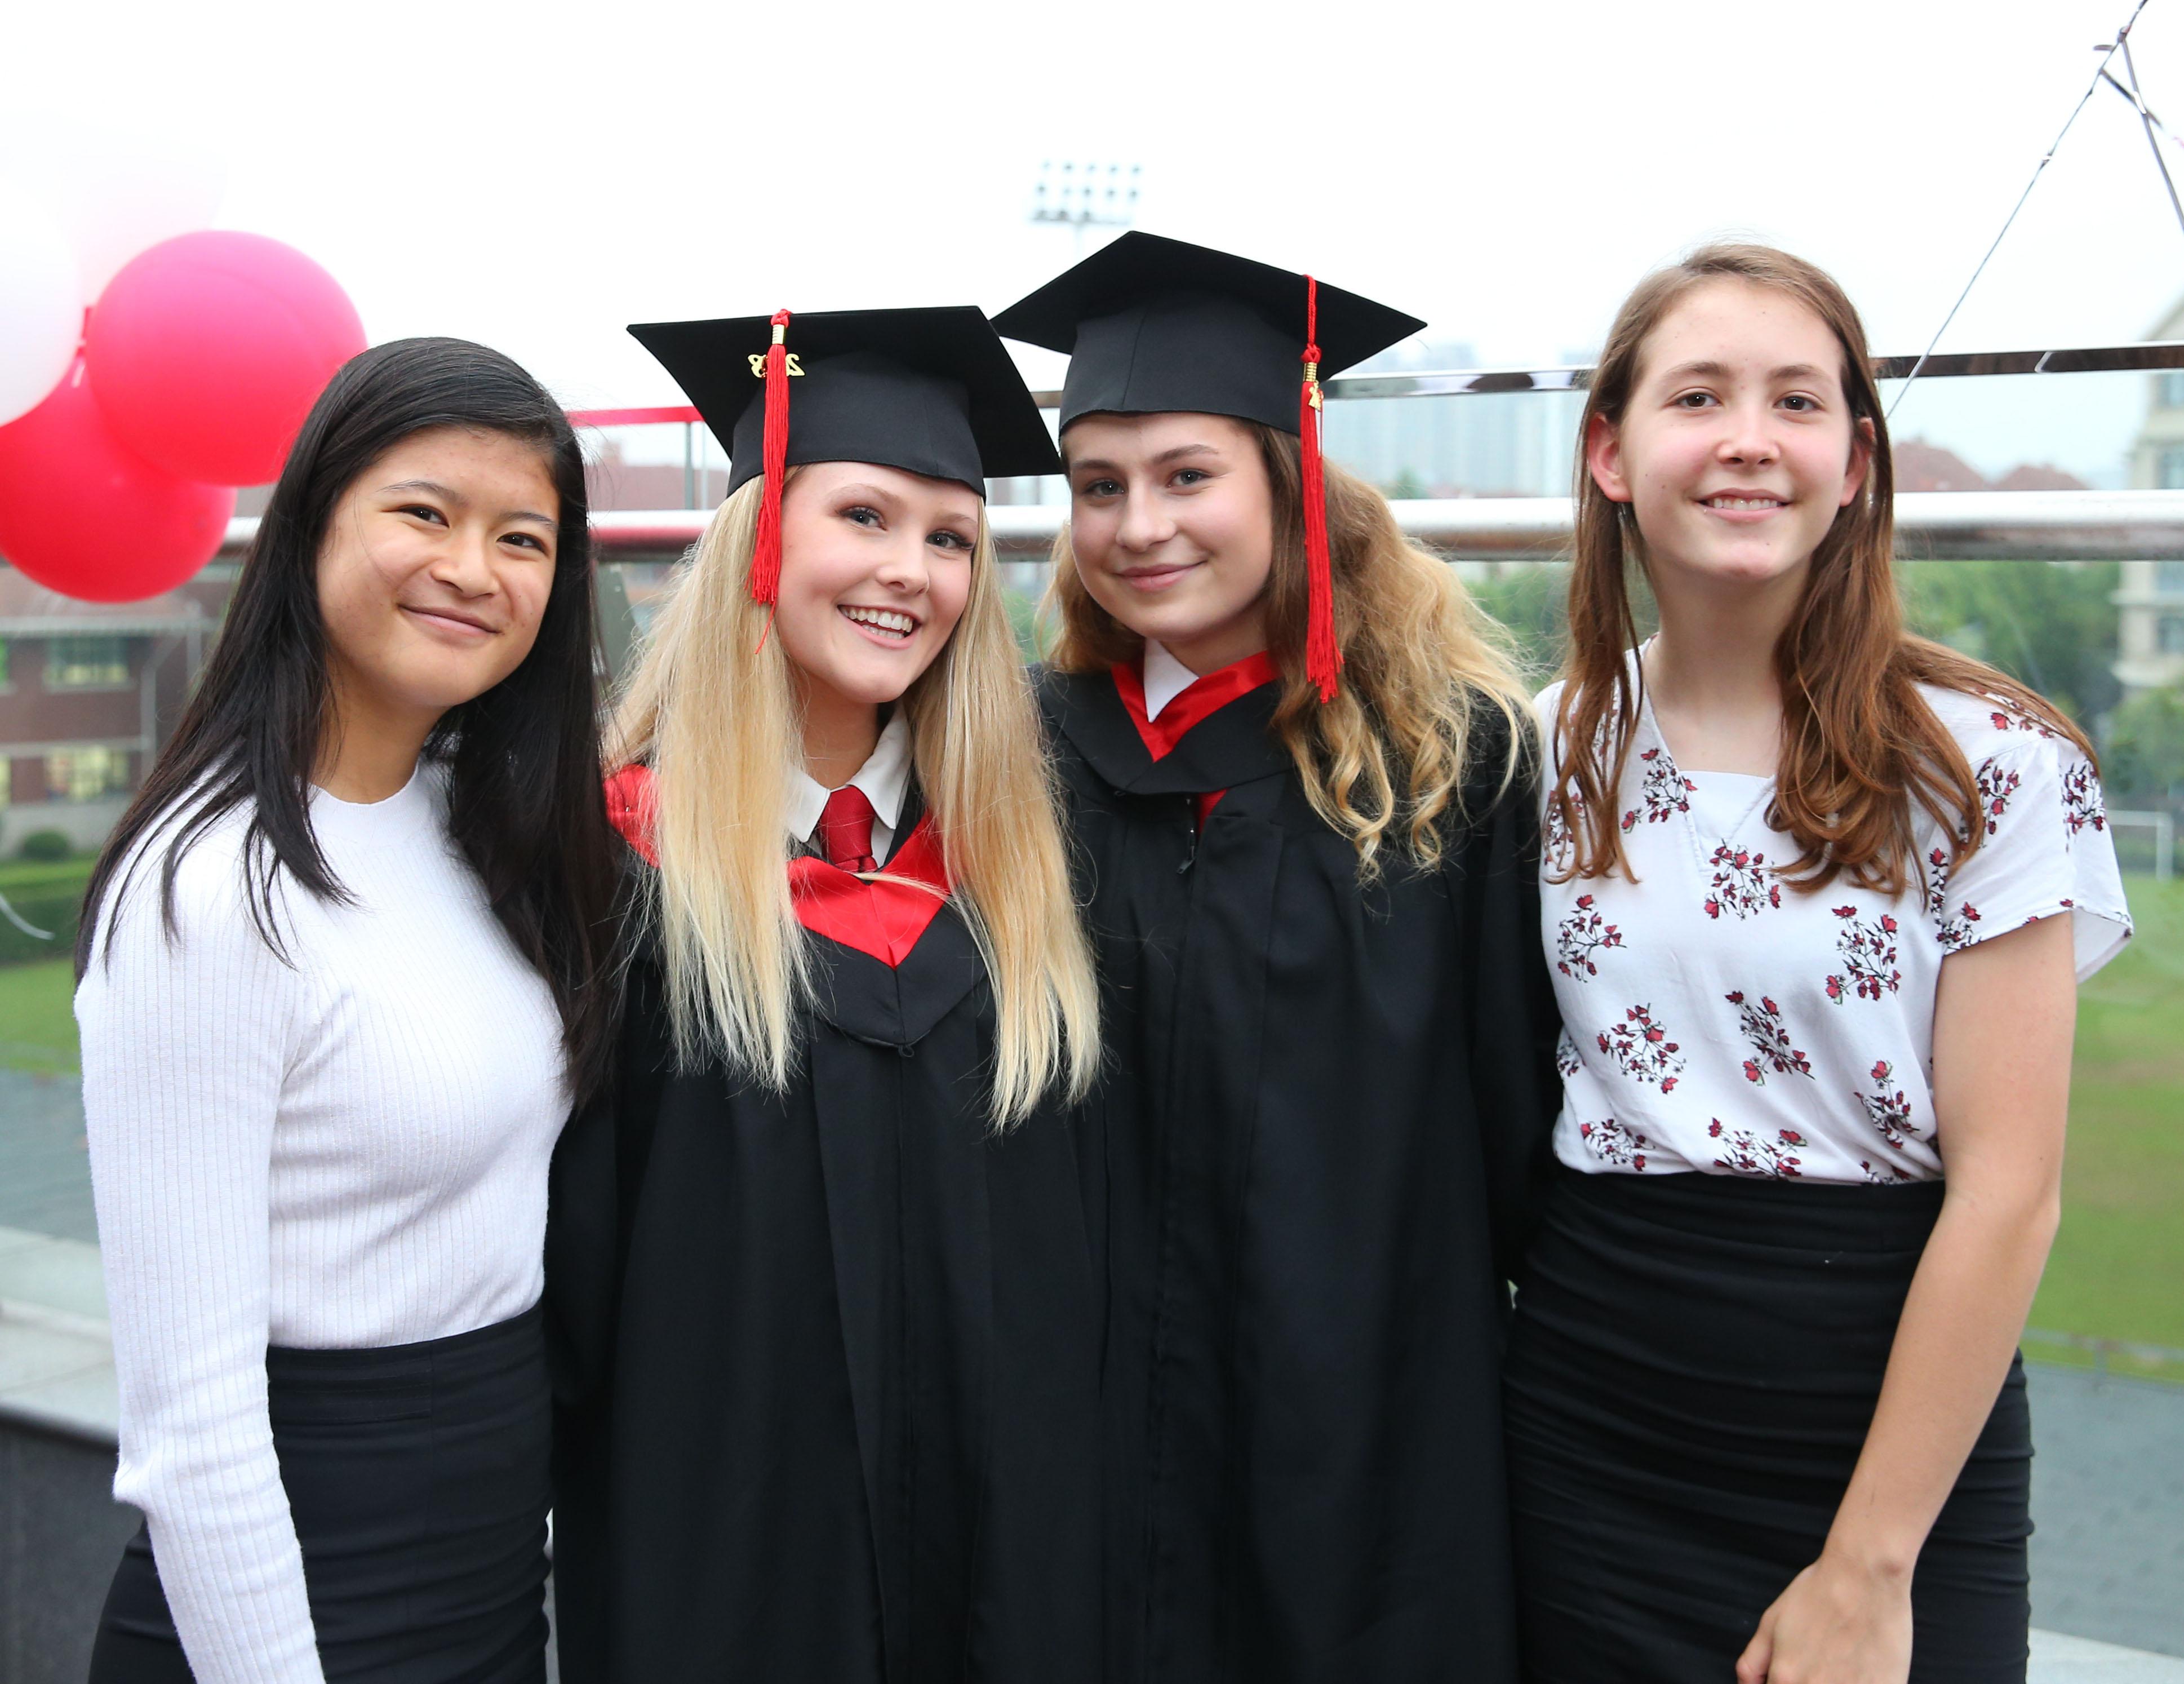 graduation-photo-2-Dulwich_College_Shanghai_Pudong-20200910-122727-505